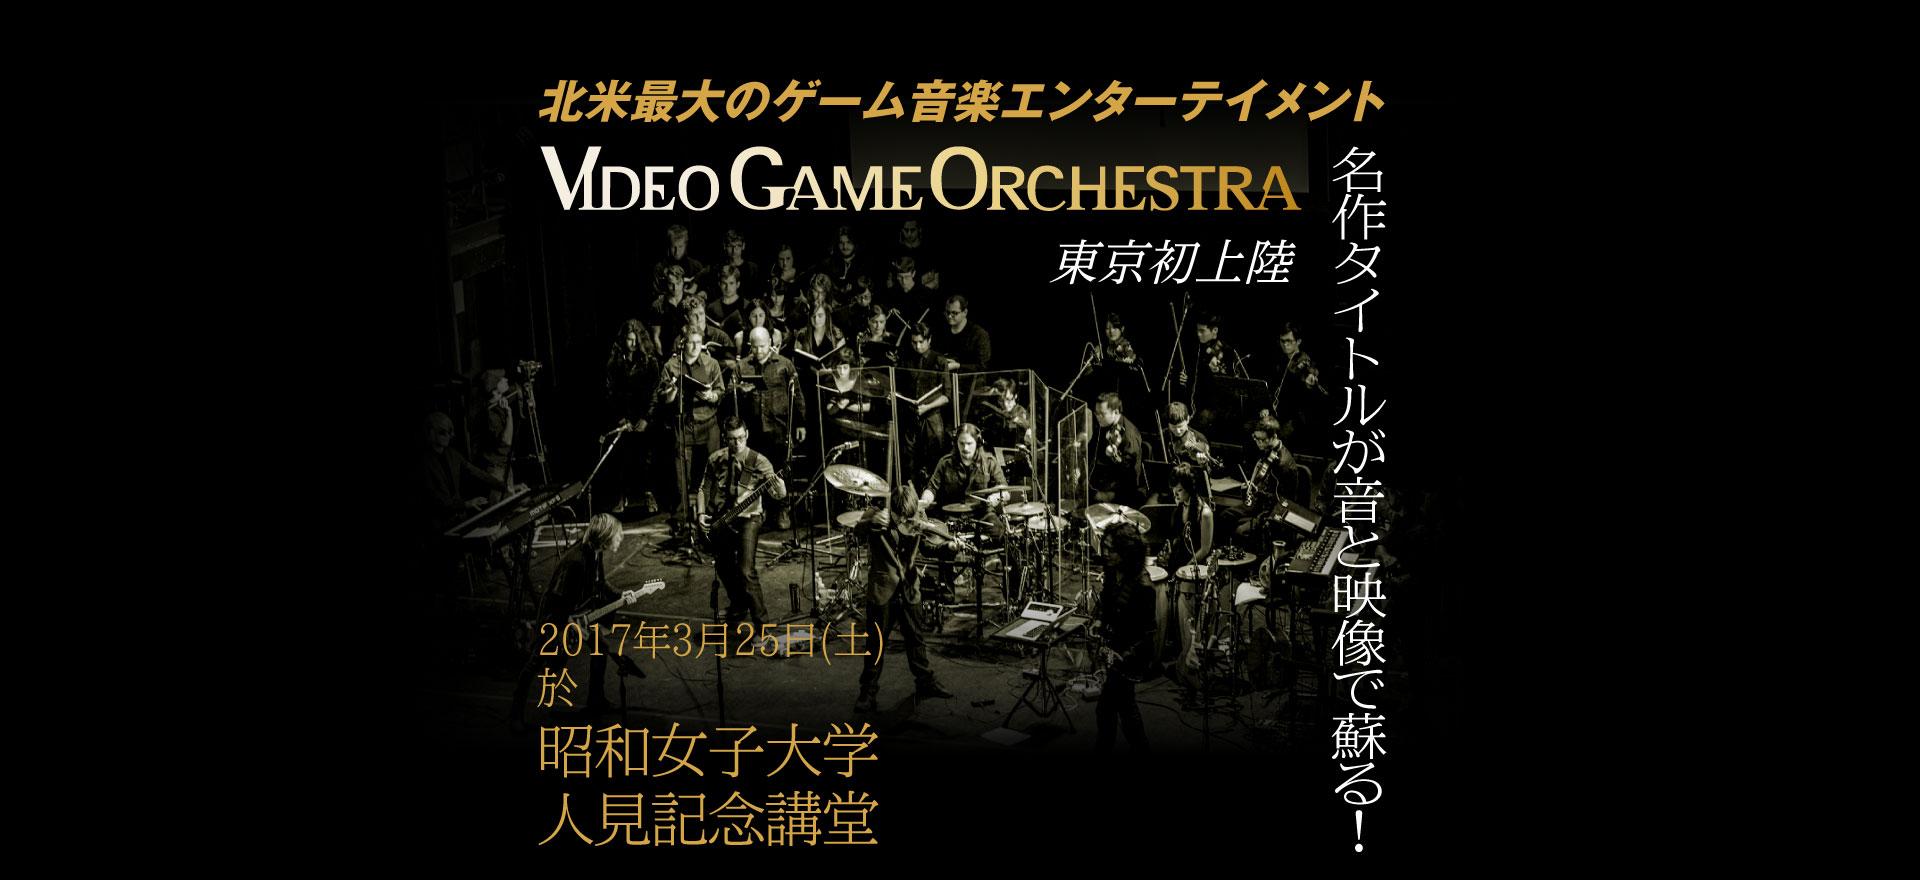 videogameorchestraconcert